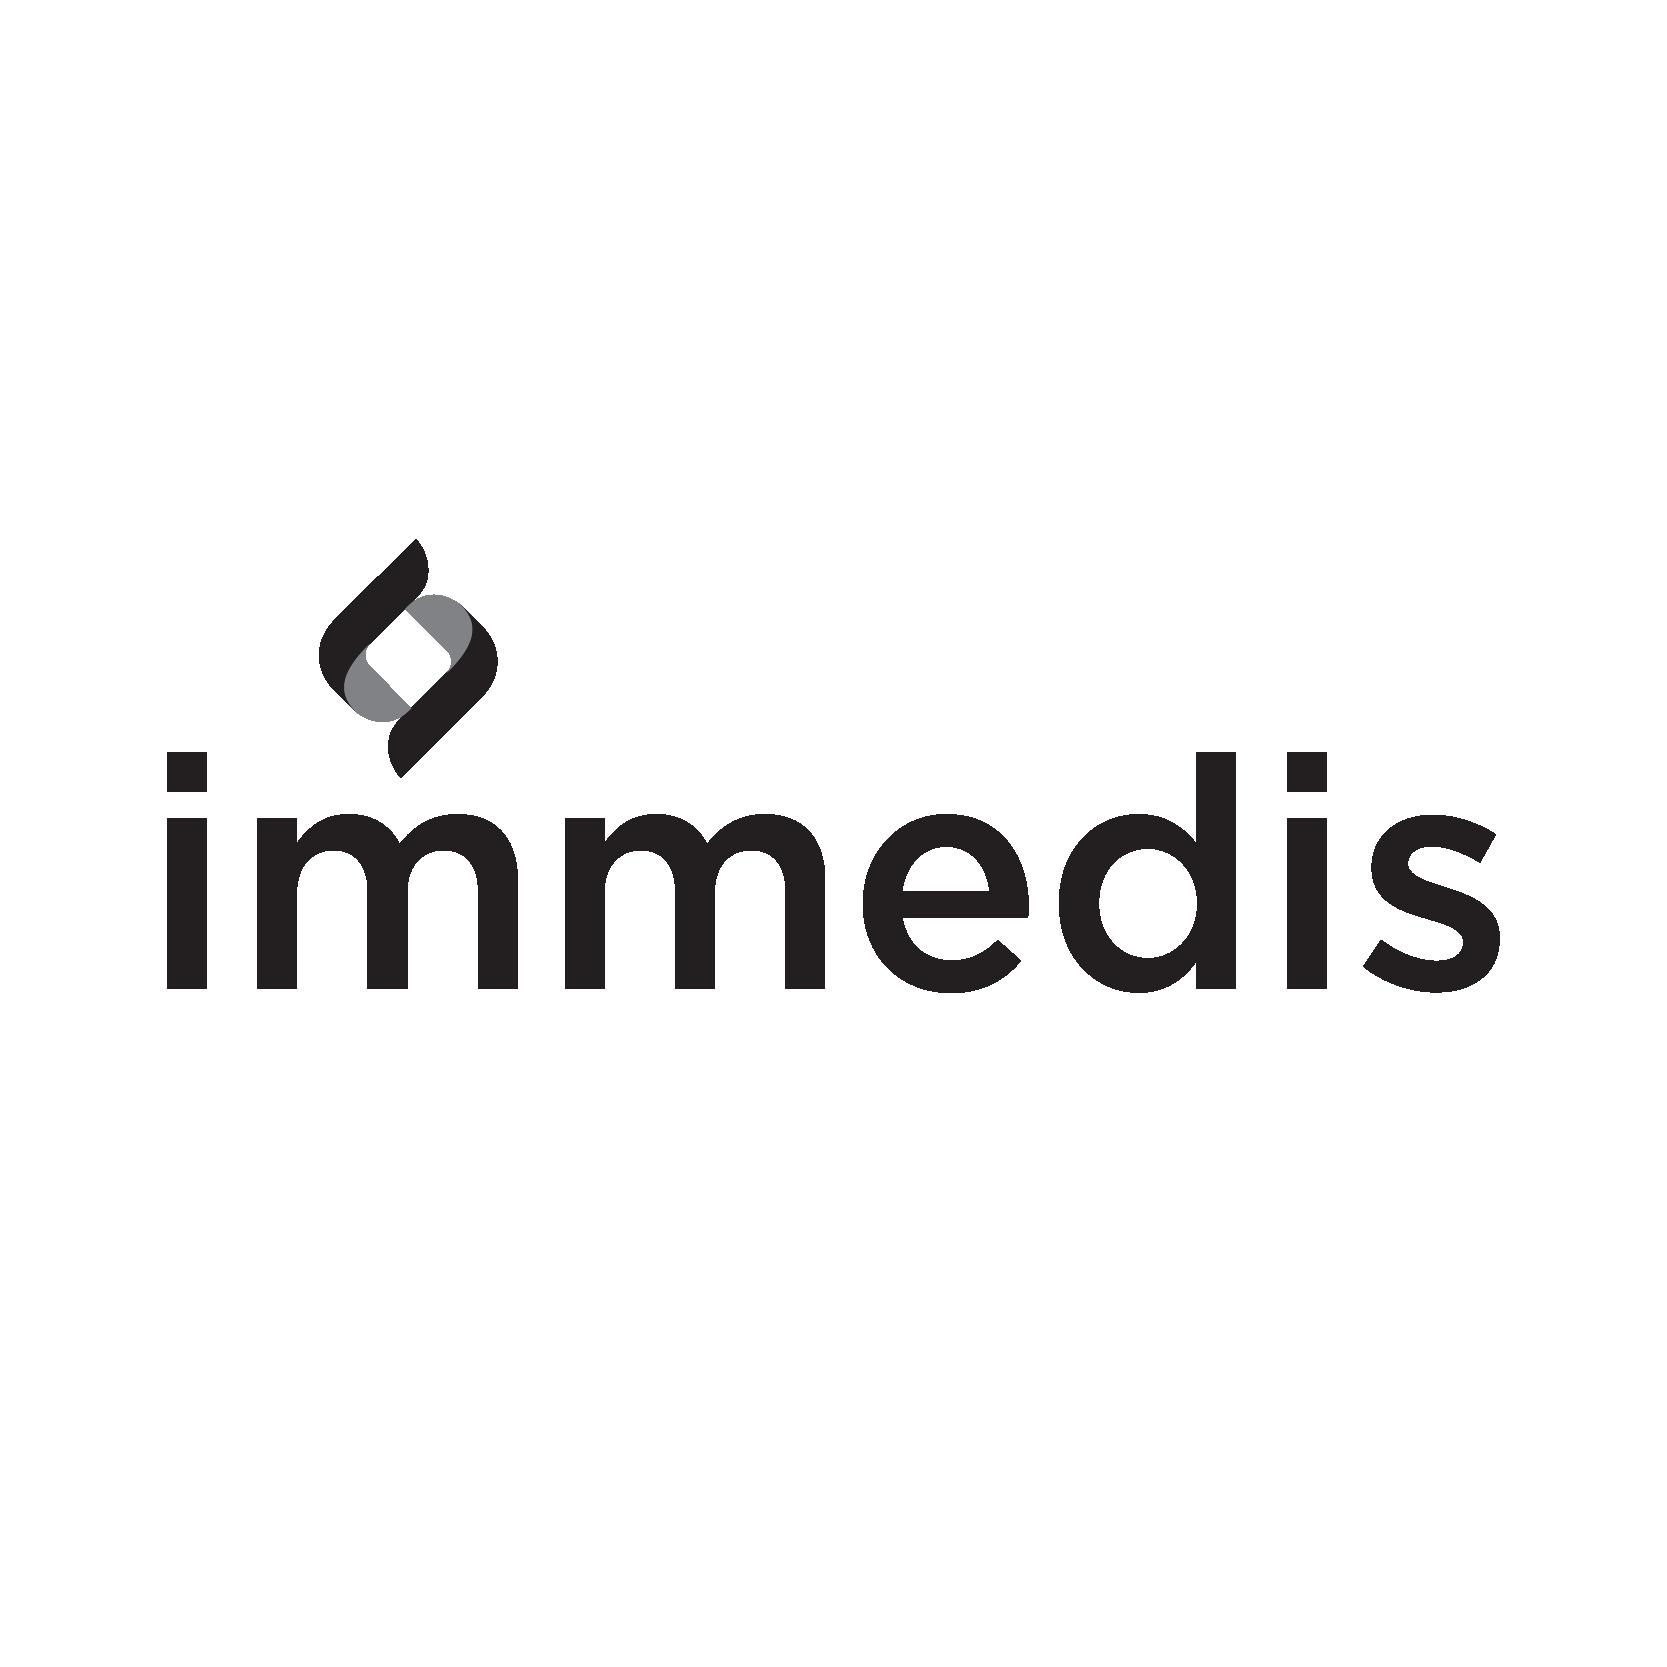 Immedis client logo